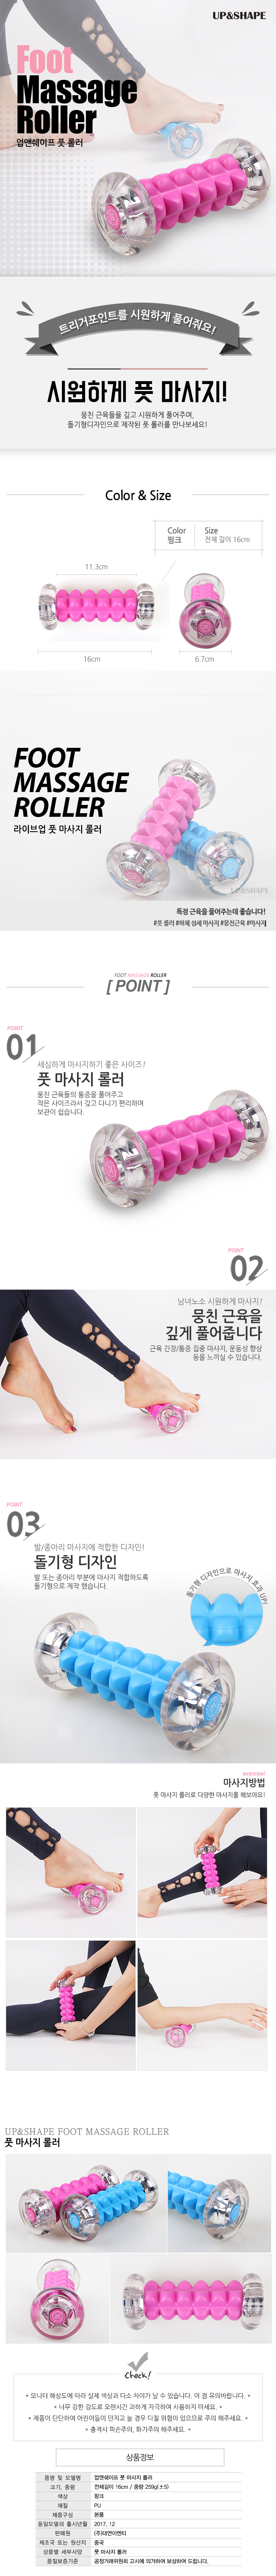 up_foot_massage_roller_860.jpg